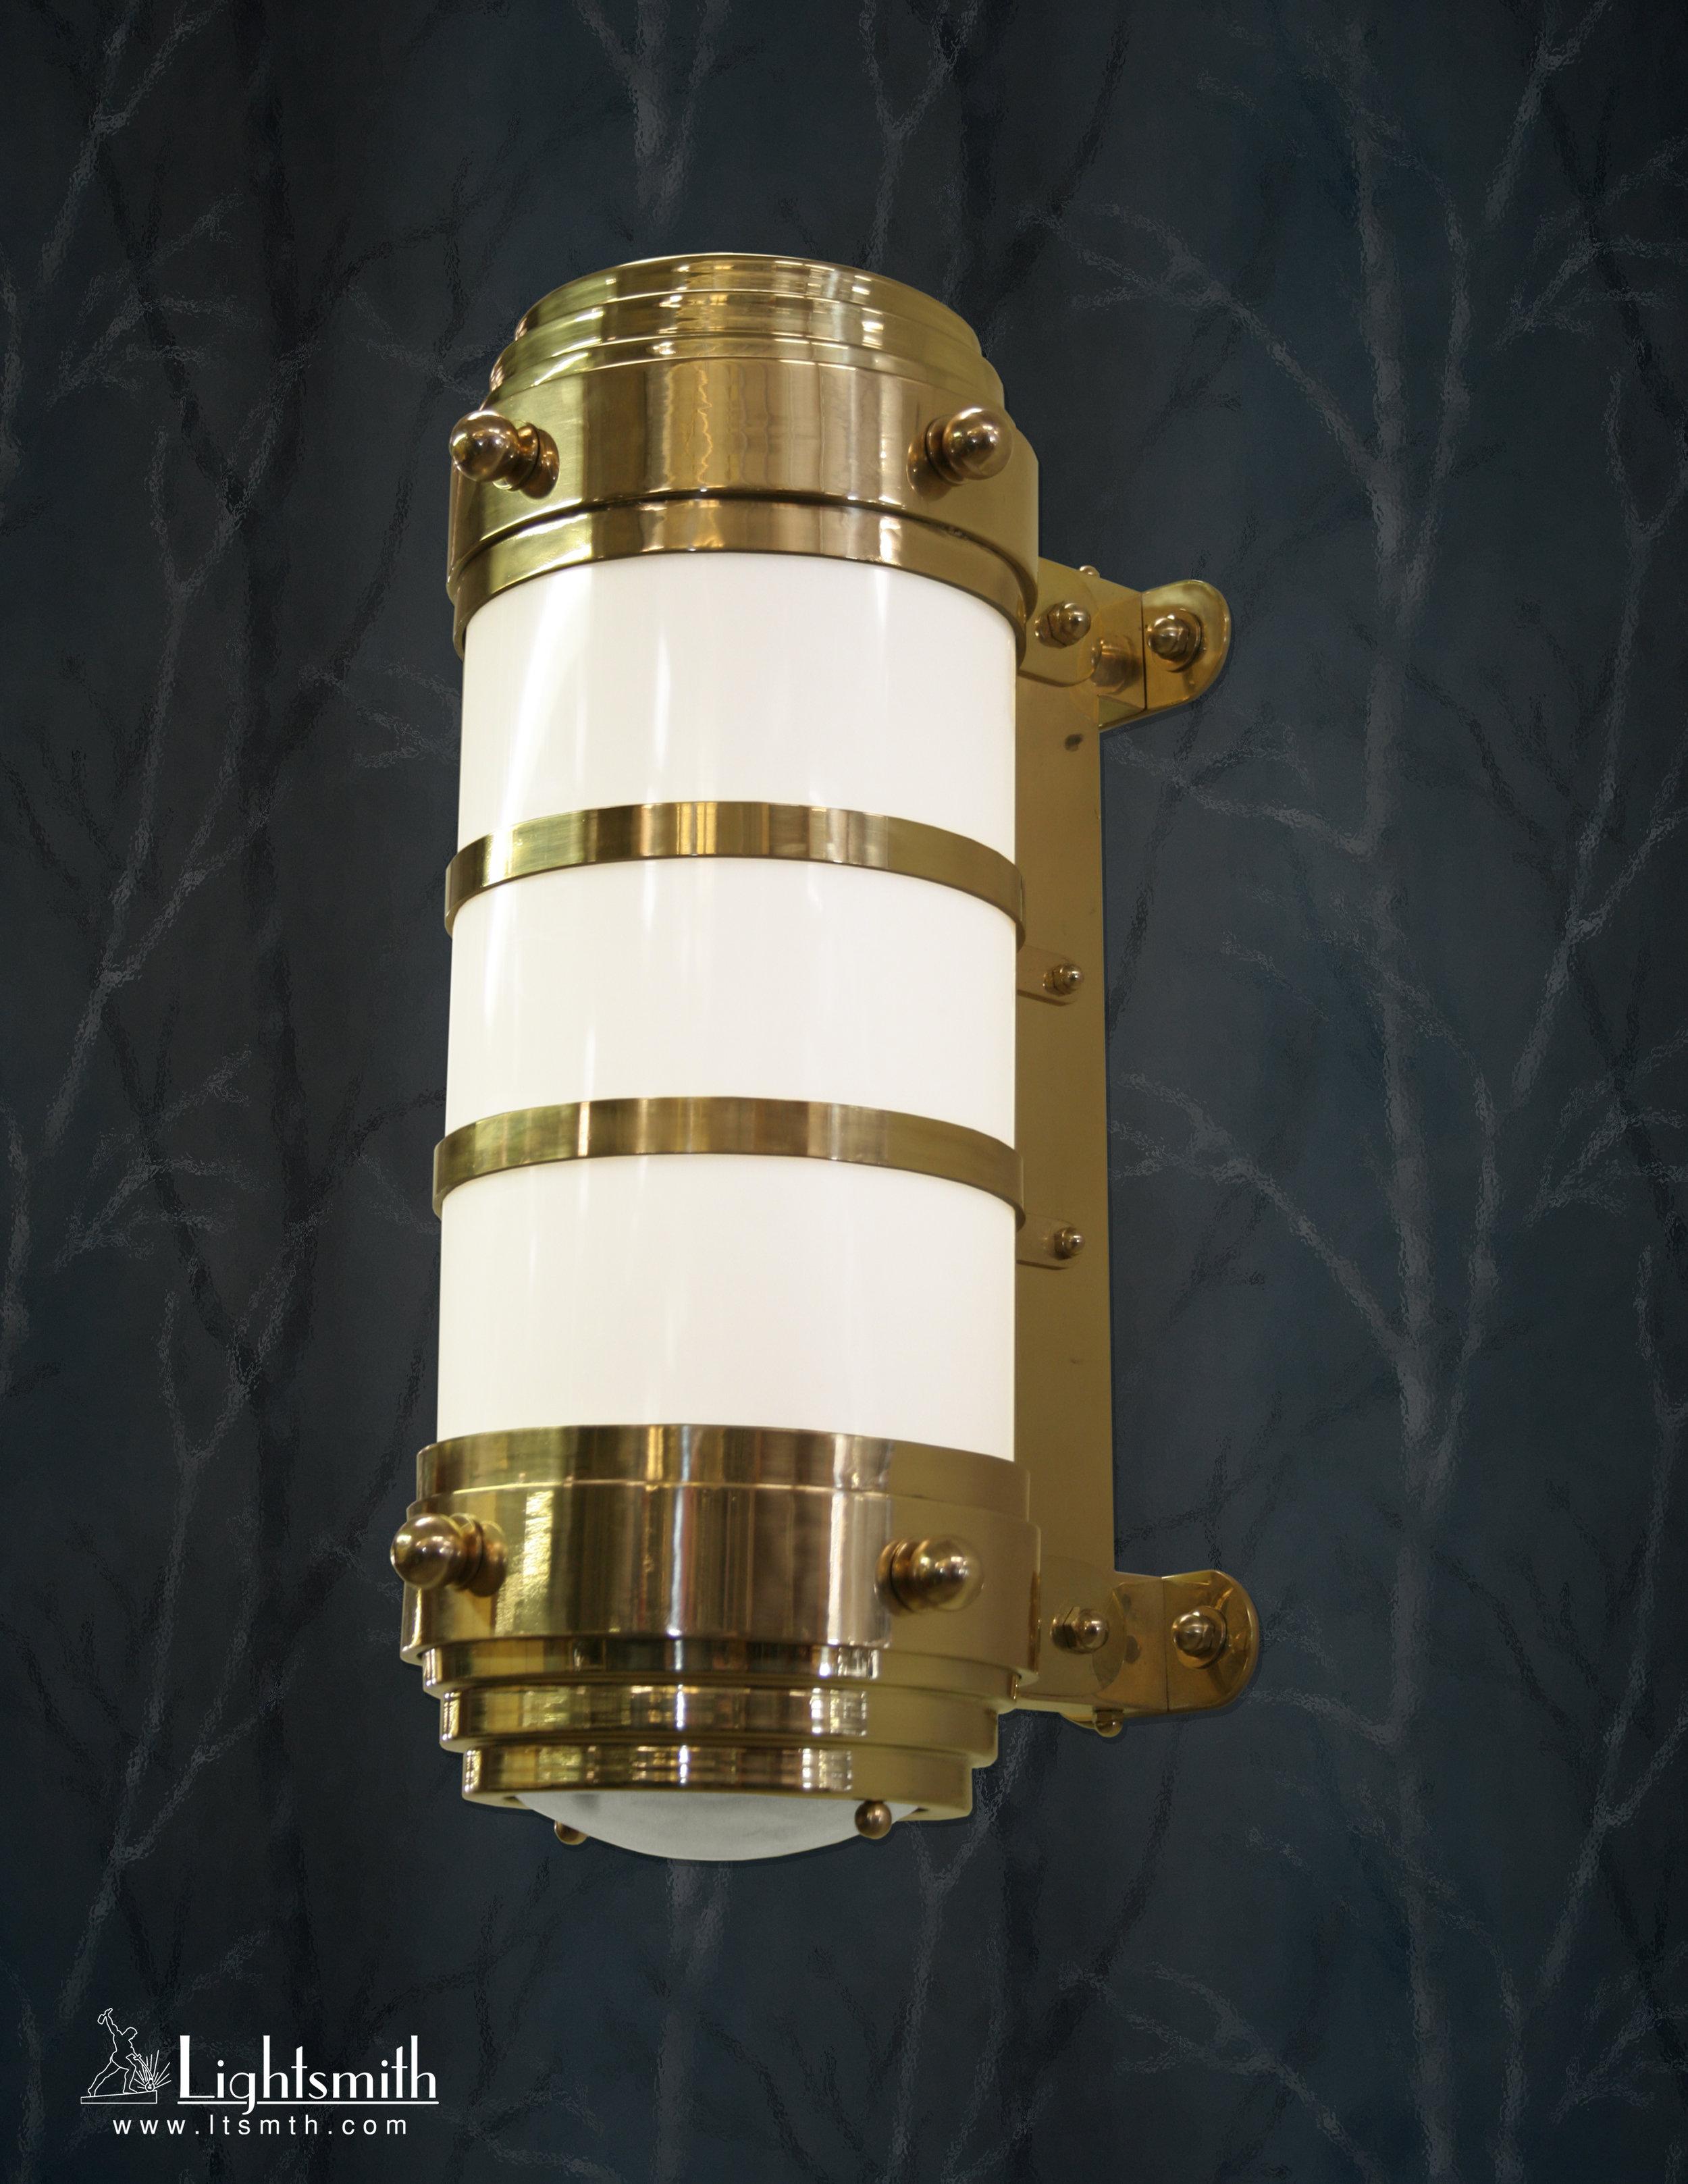 SC-11710 - Polished Brass - White Opal Acrylic